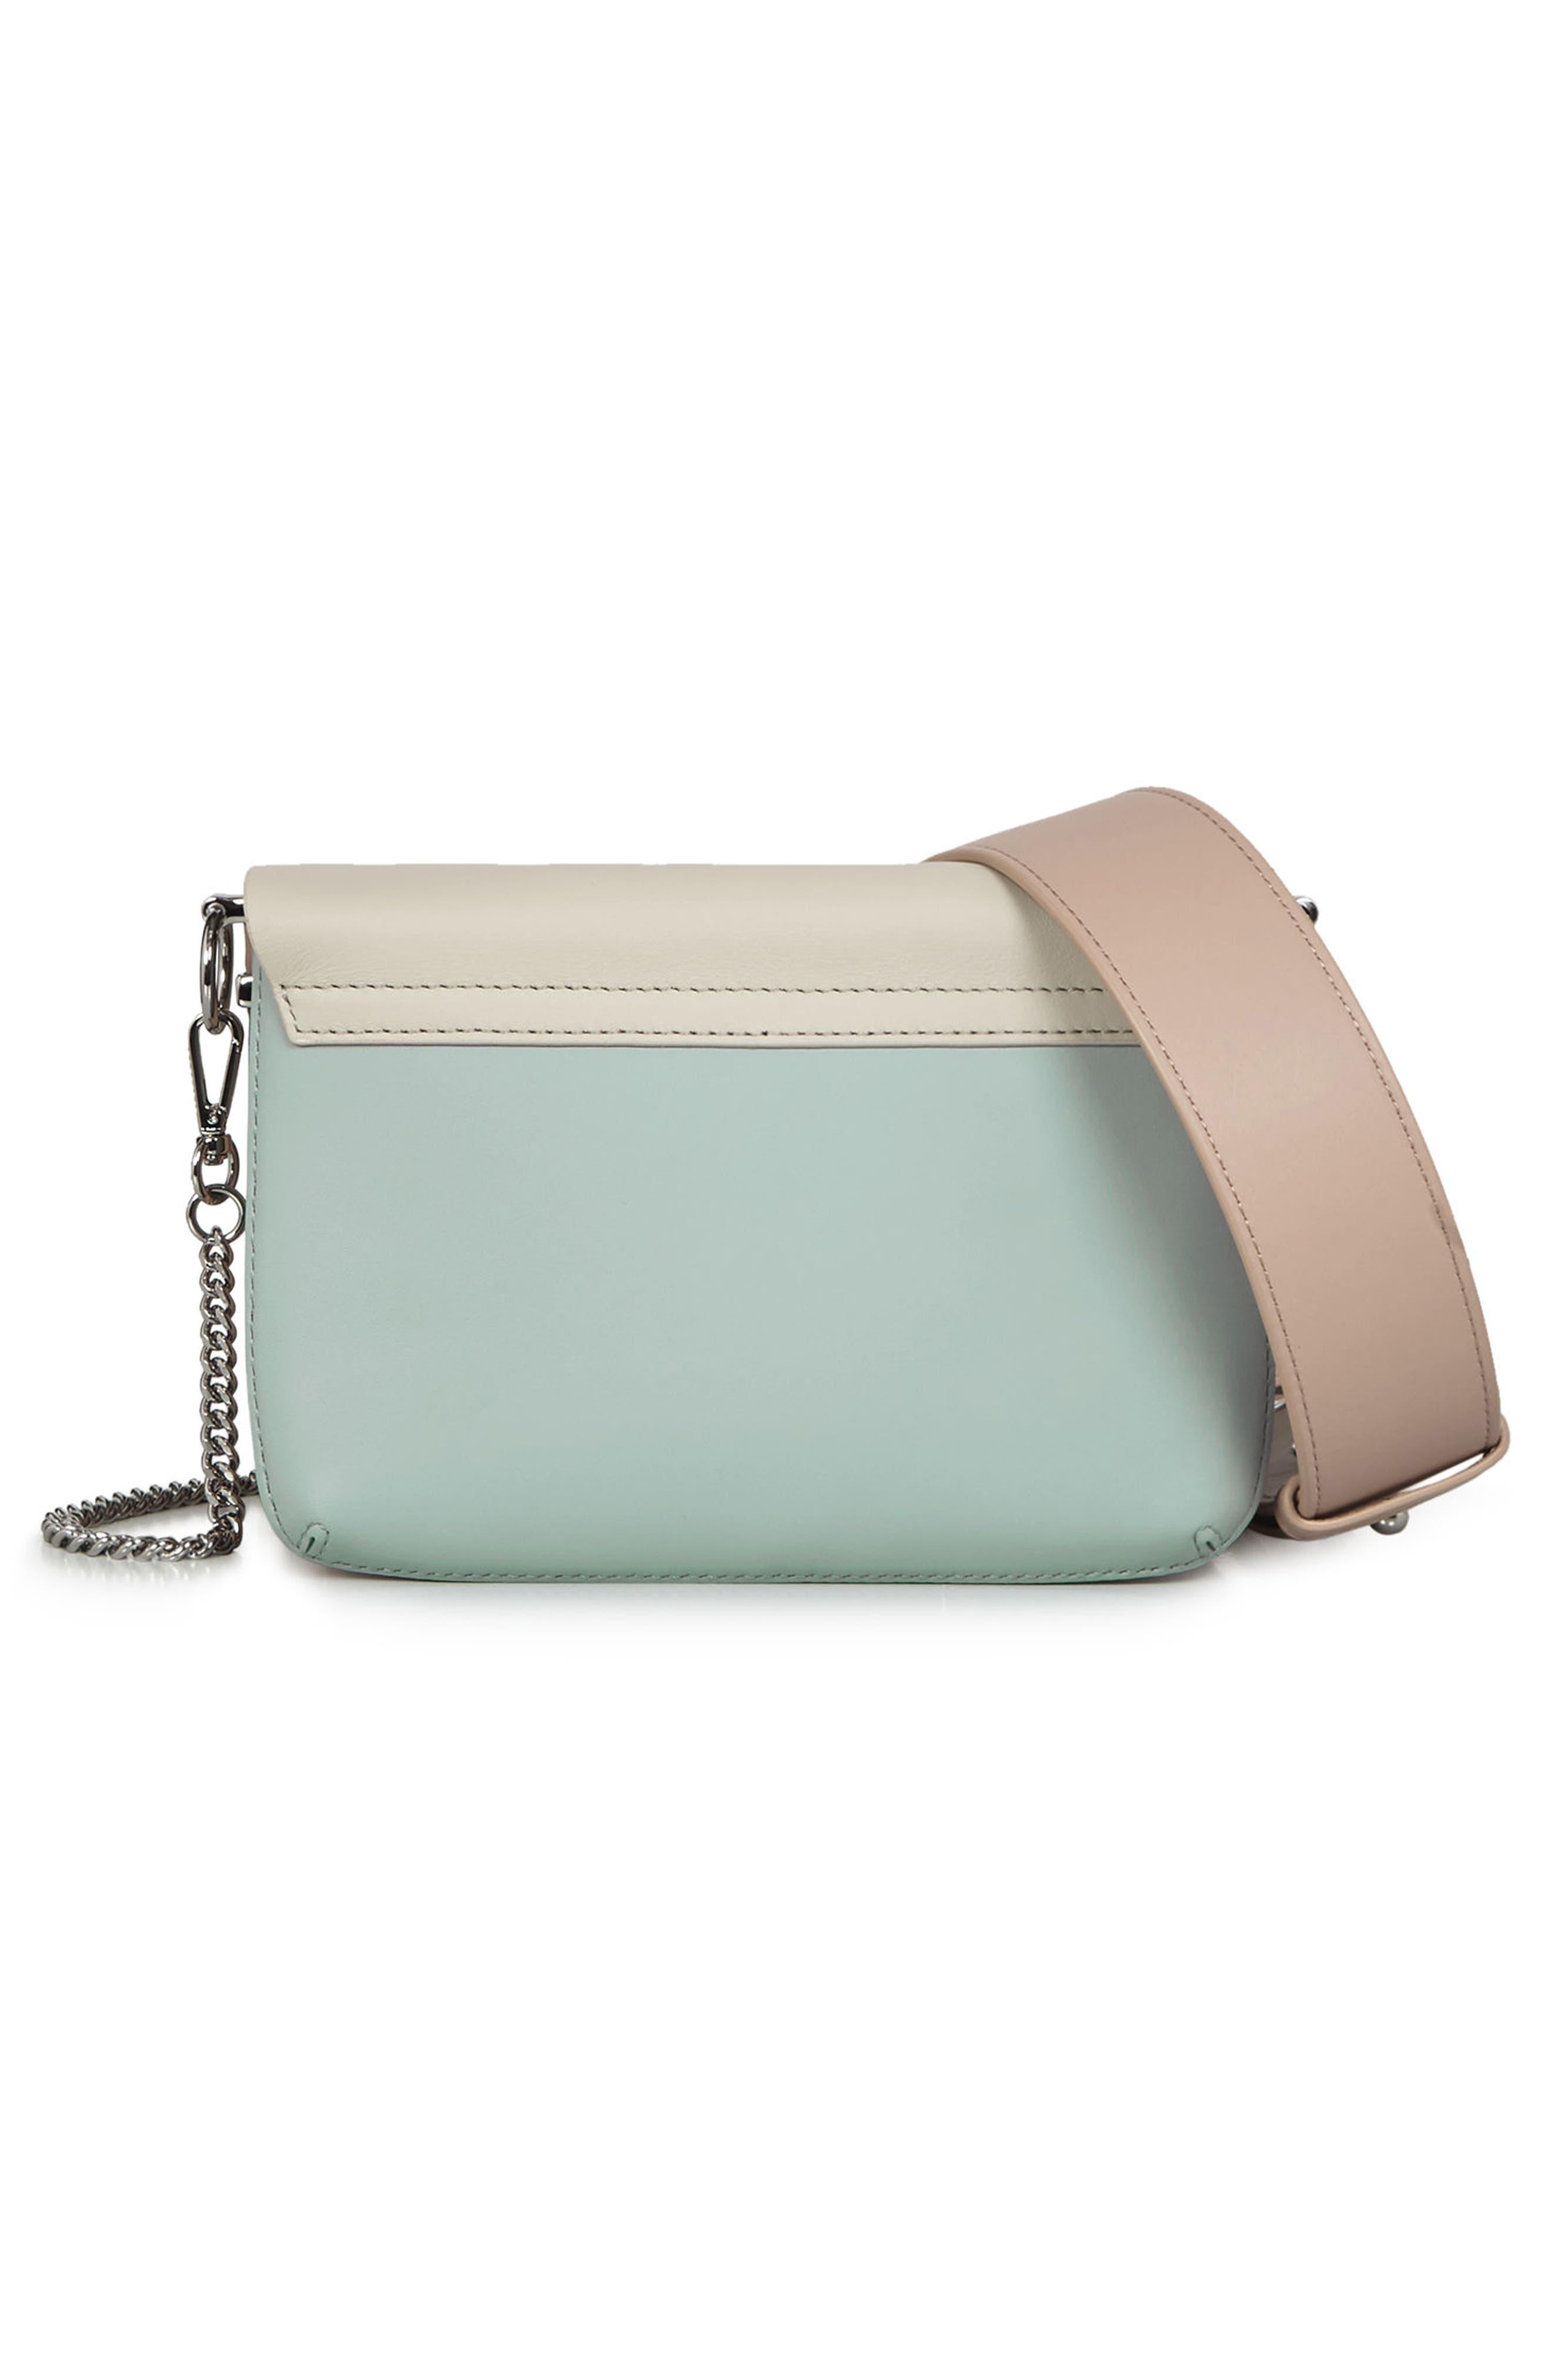 Zep Colorblock Leather Shoulder Bag,                             Alternate thumbnail 2, color,                             115